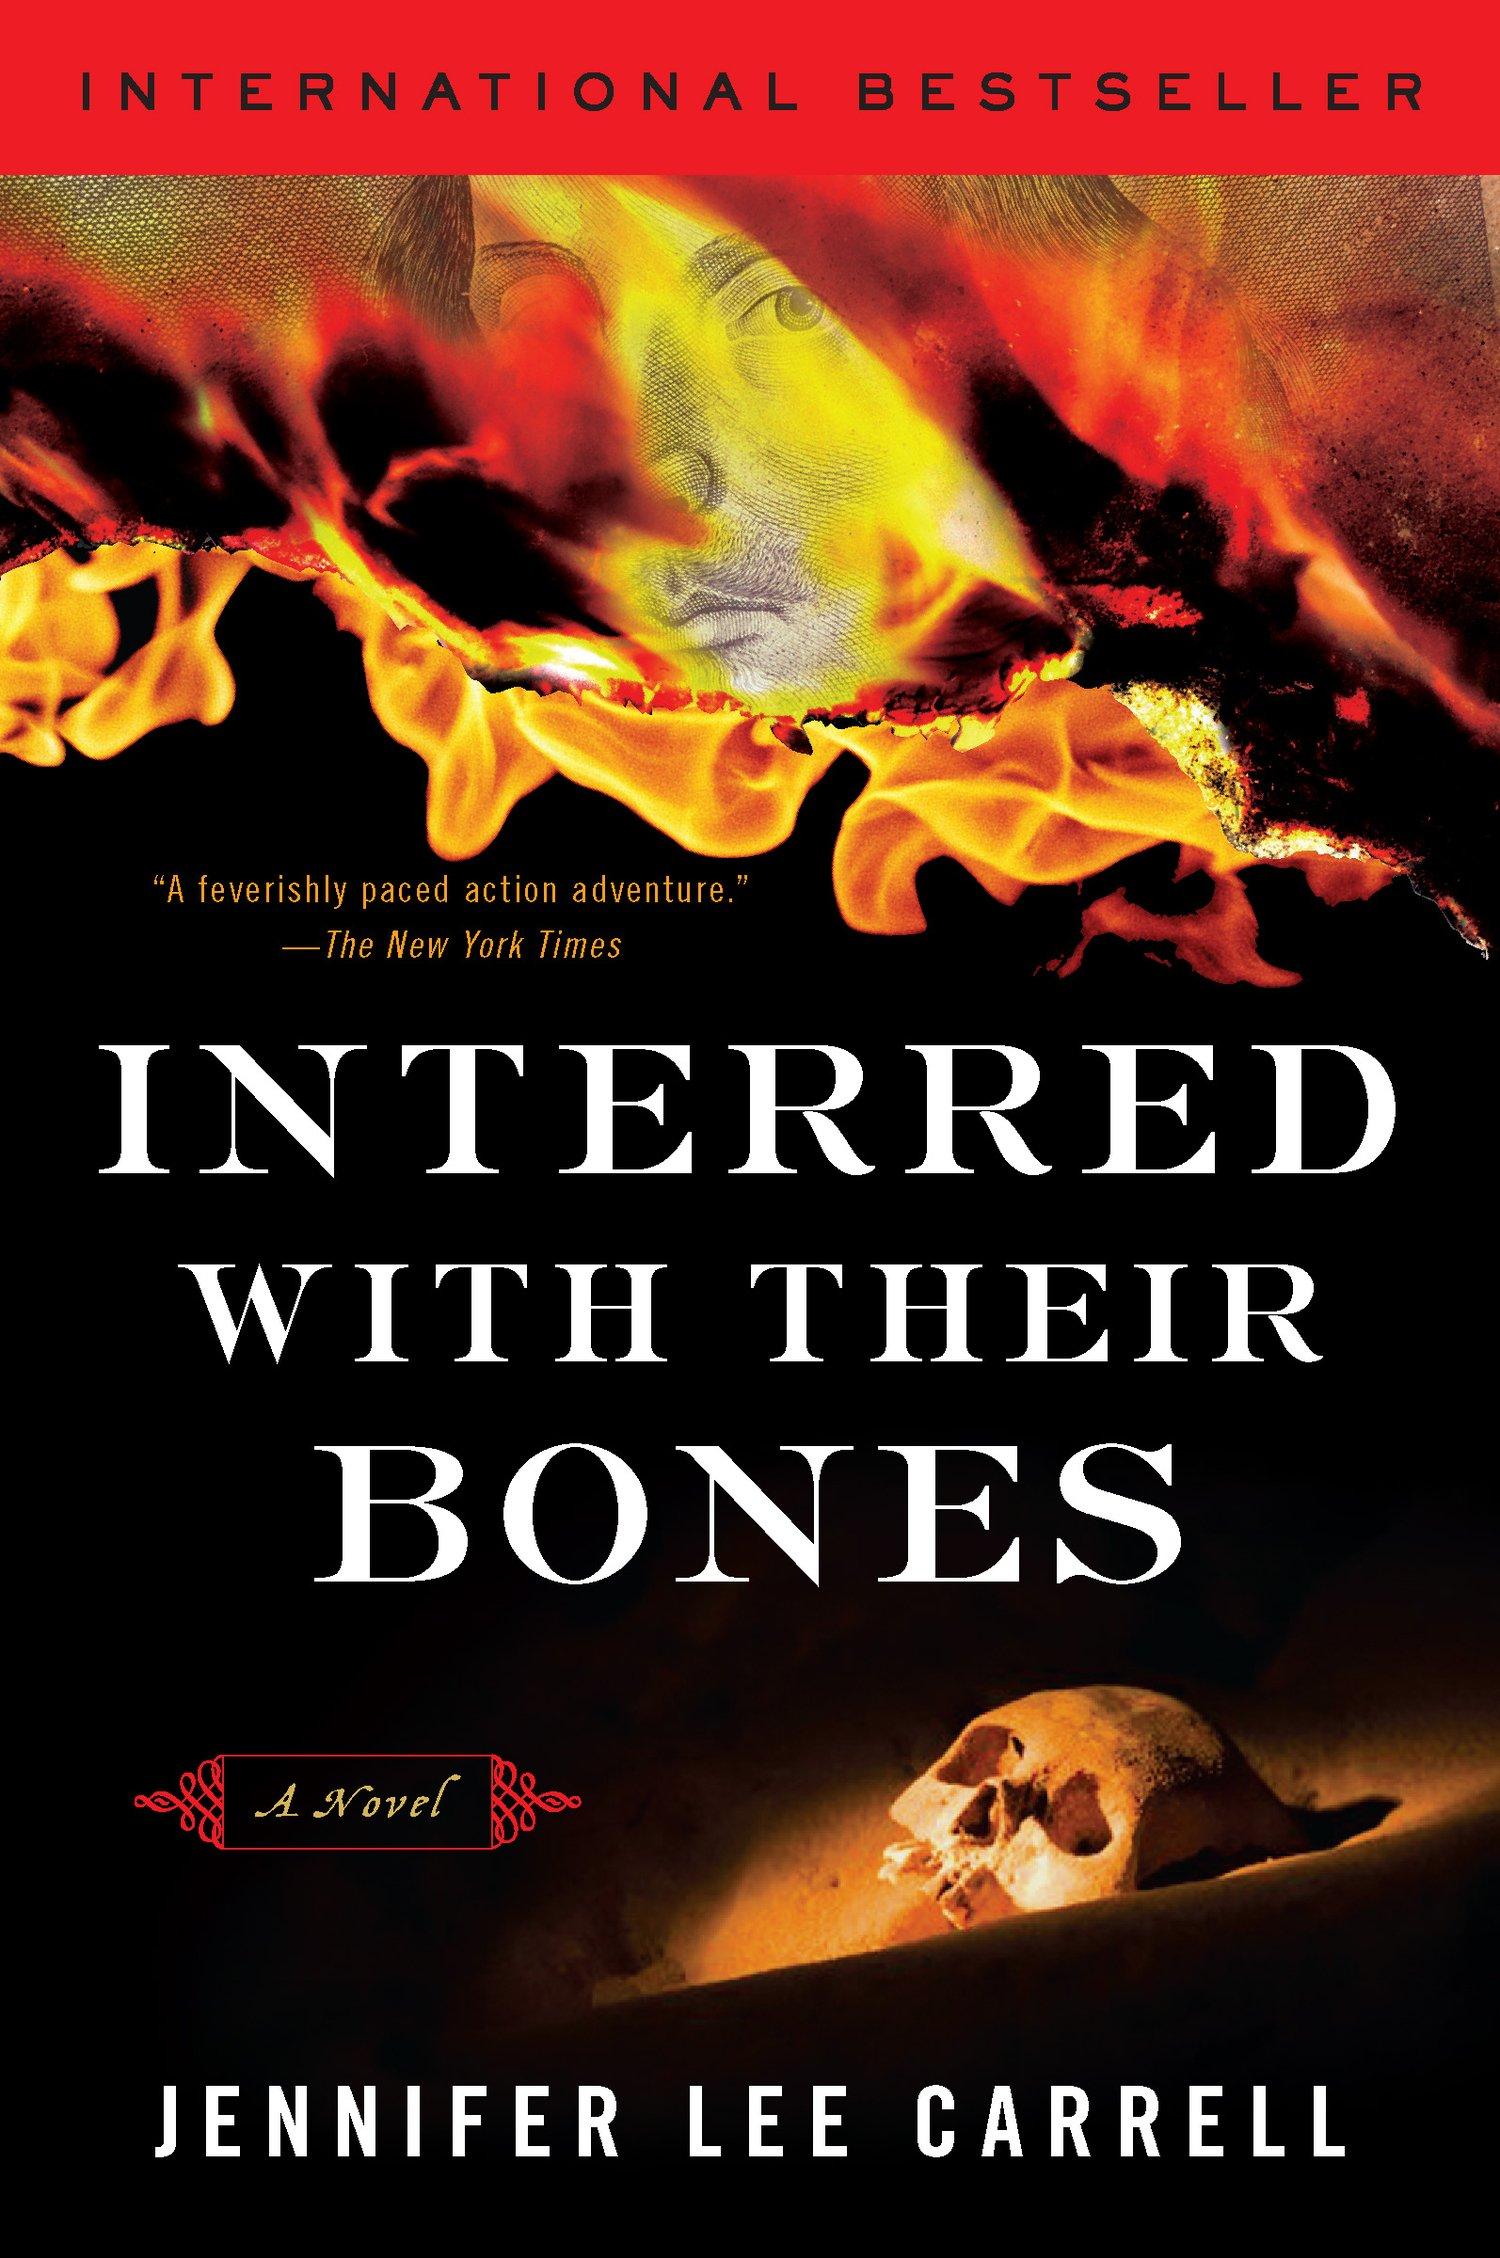 "Interred With Their Bones / The Shakespeare Secret: ""Glorious fun"" (trailer)"